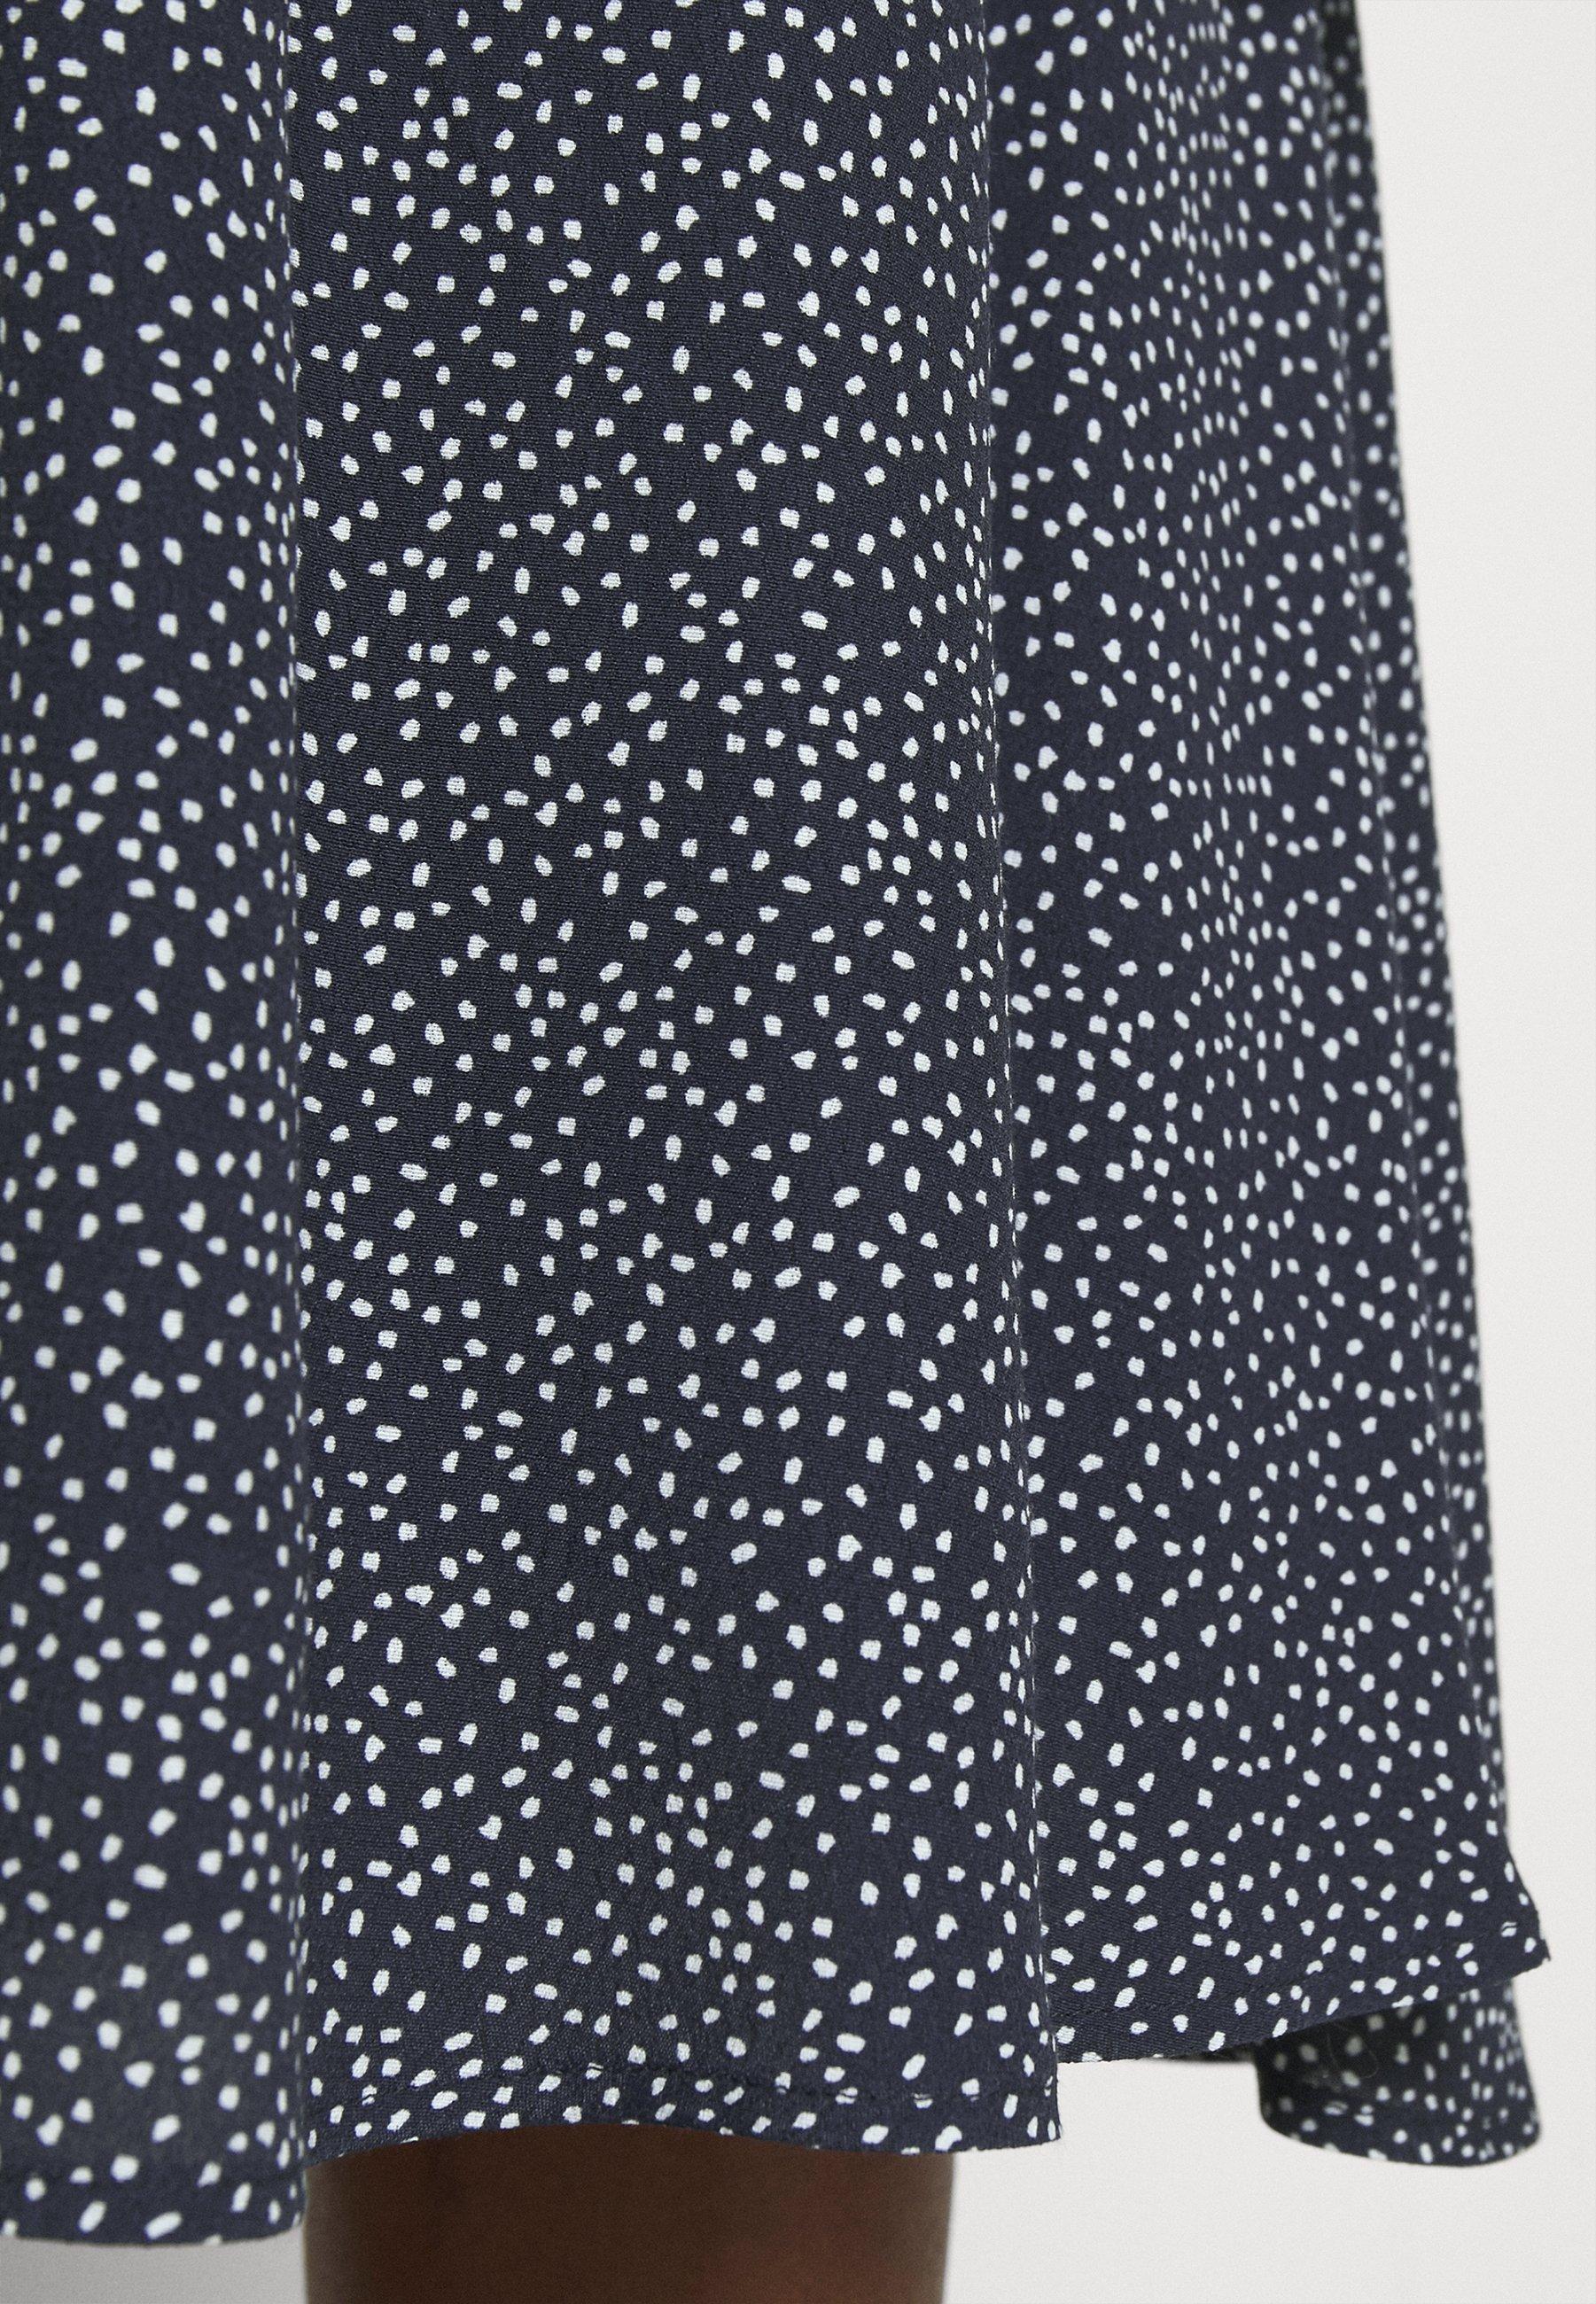 Femme NUCOURTNEY SKIRT - Jupe plissée